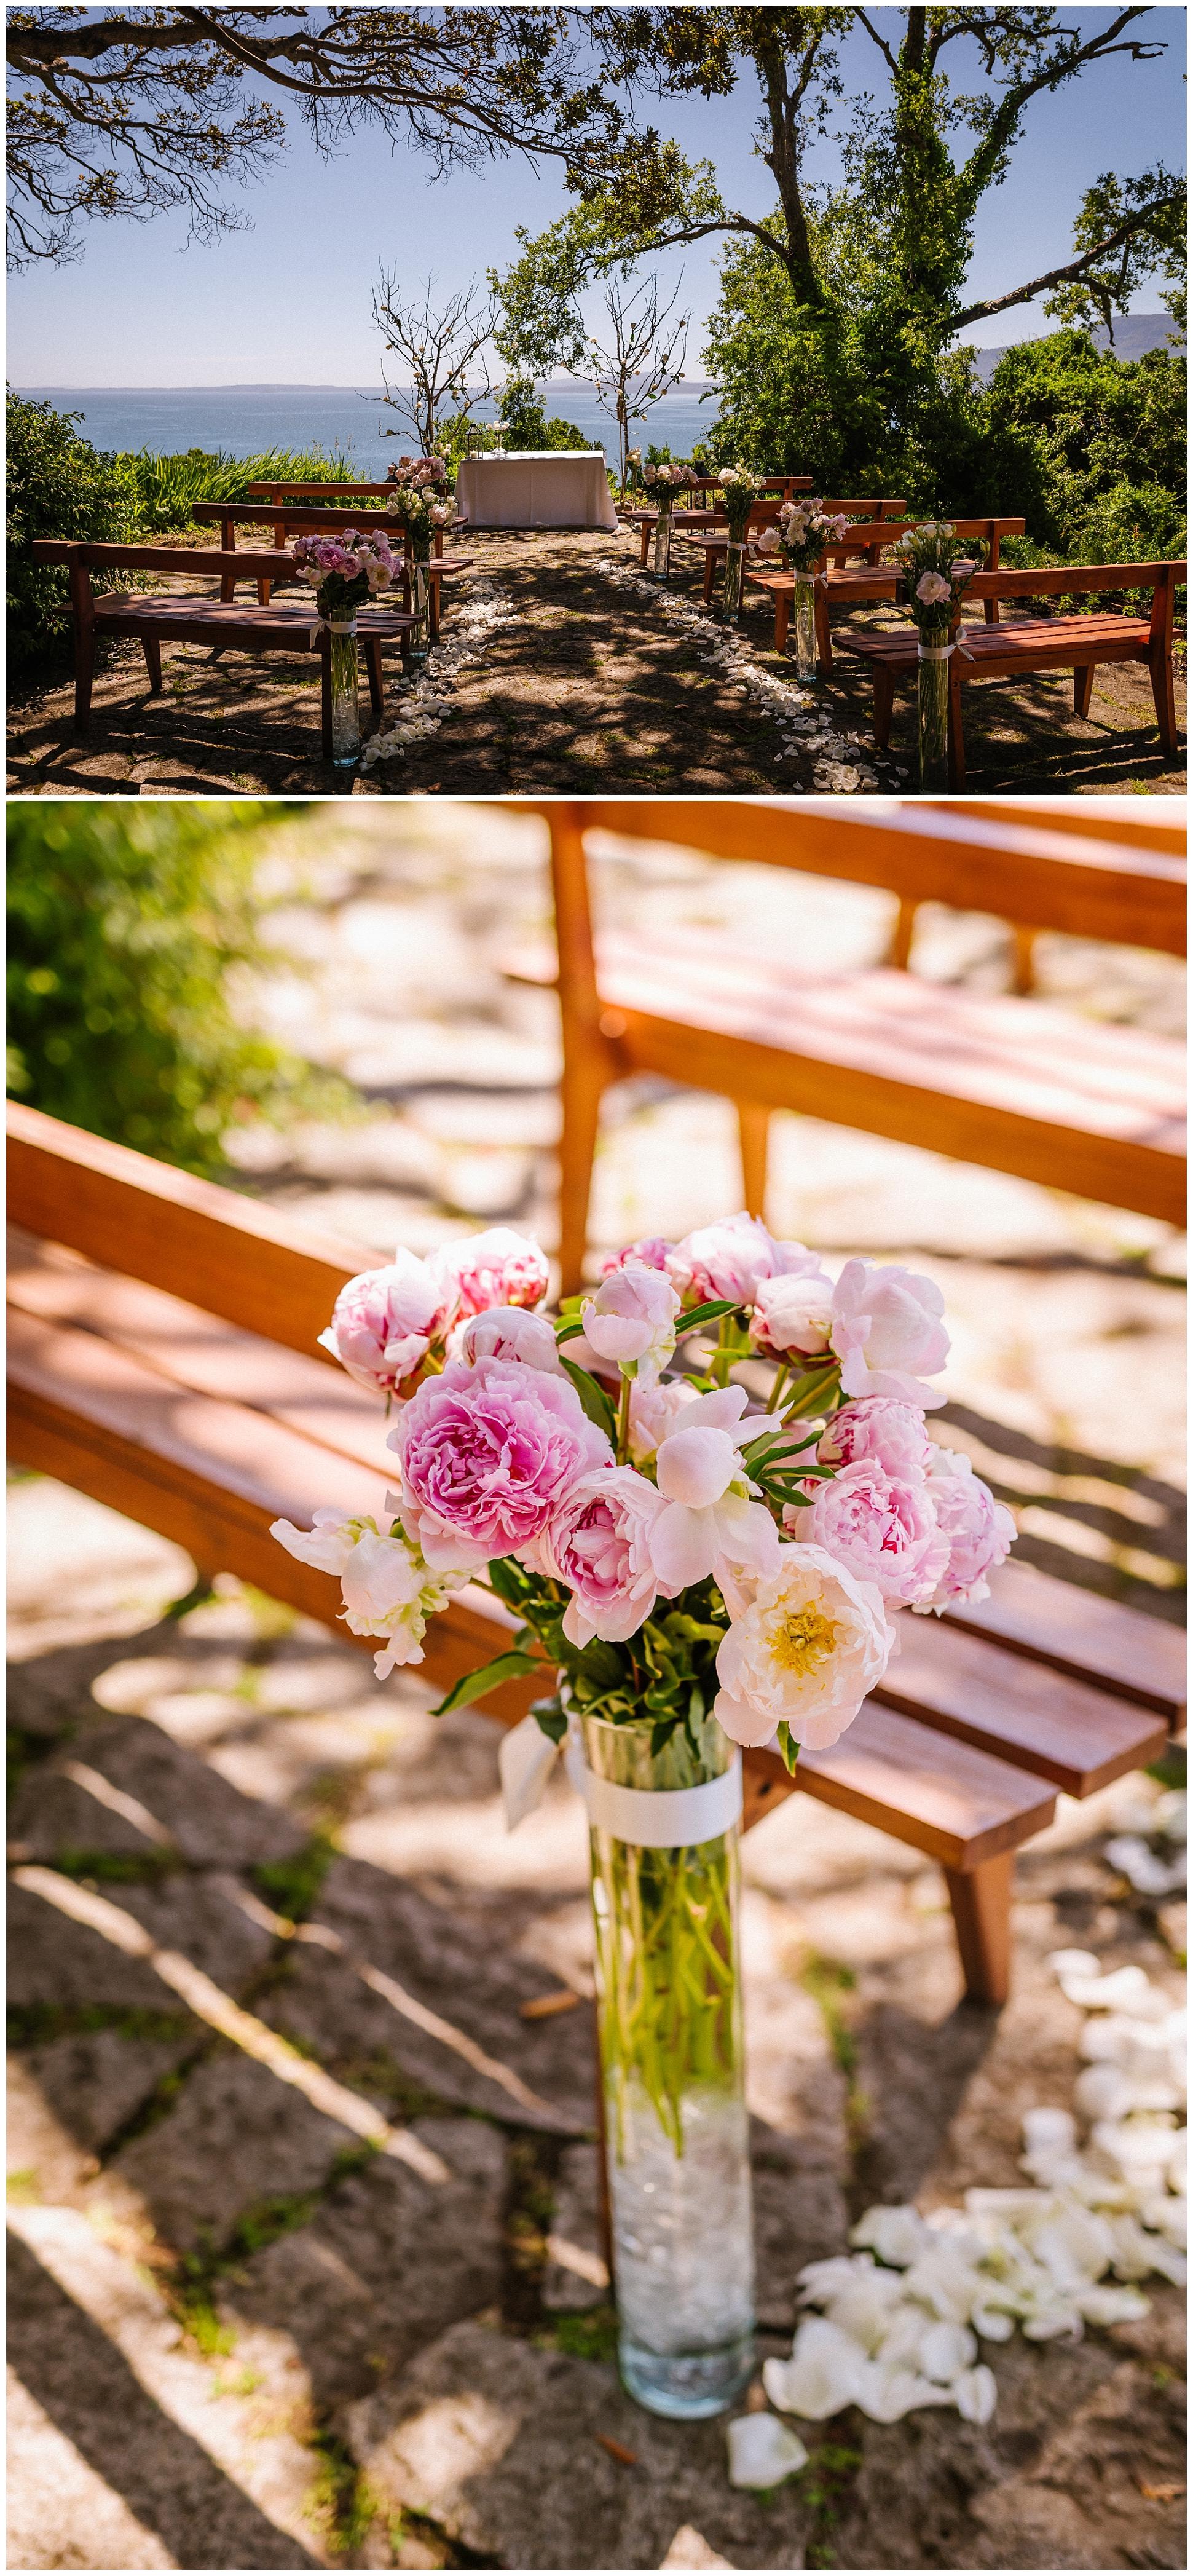 Cheilean-destination-adventure-wedding-florida-patagonia-pucon-santa-cruz-vsco_0063.jpg